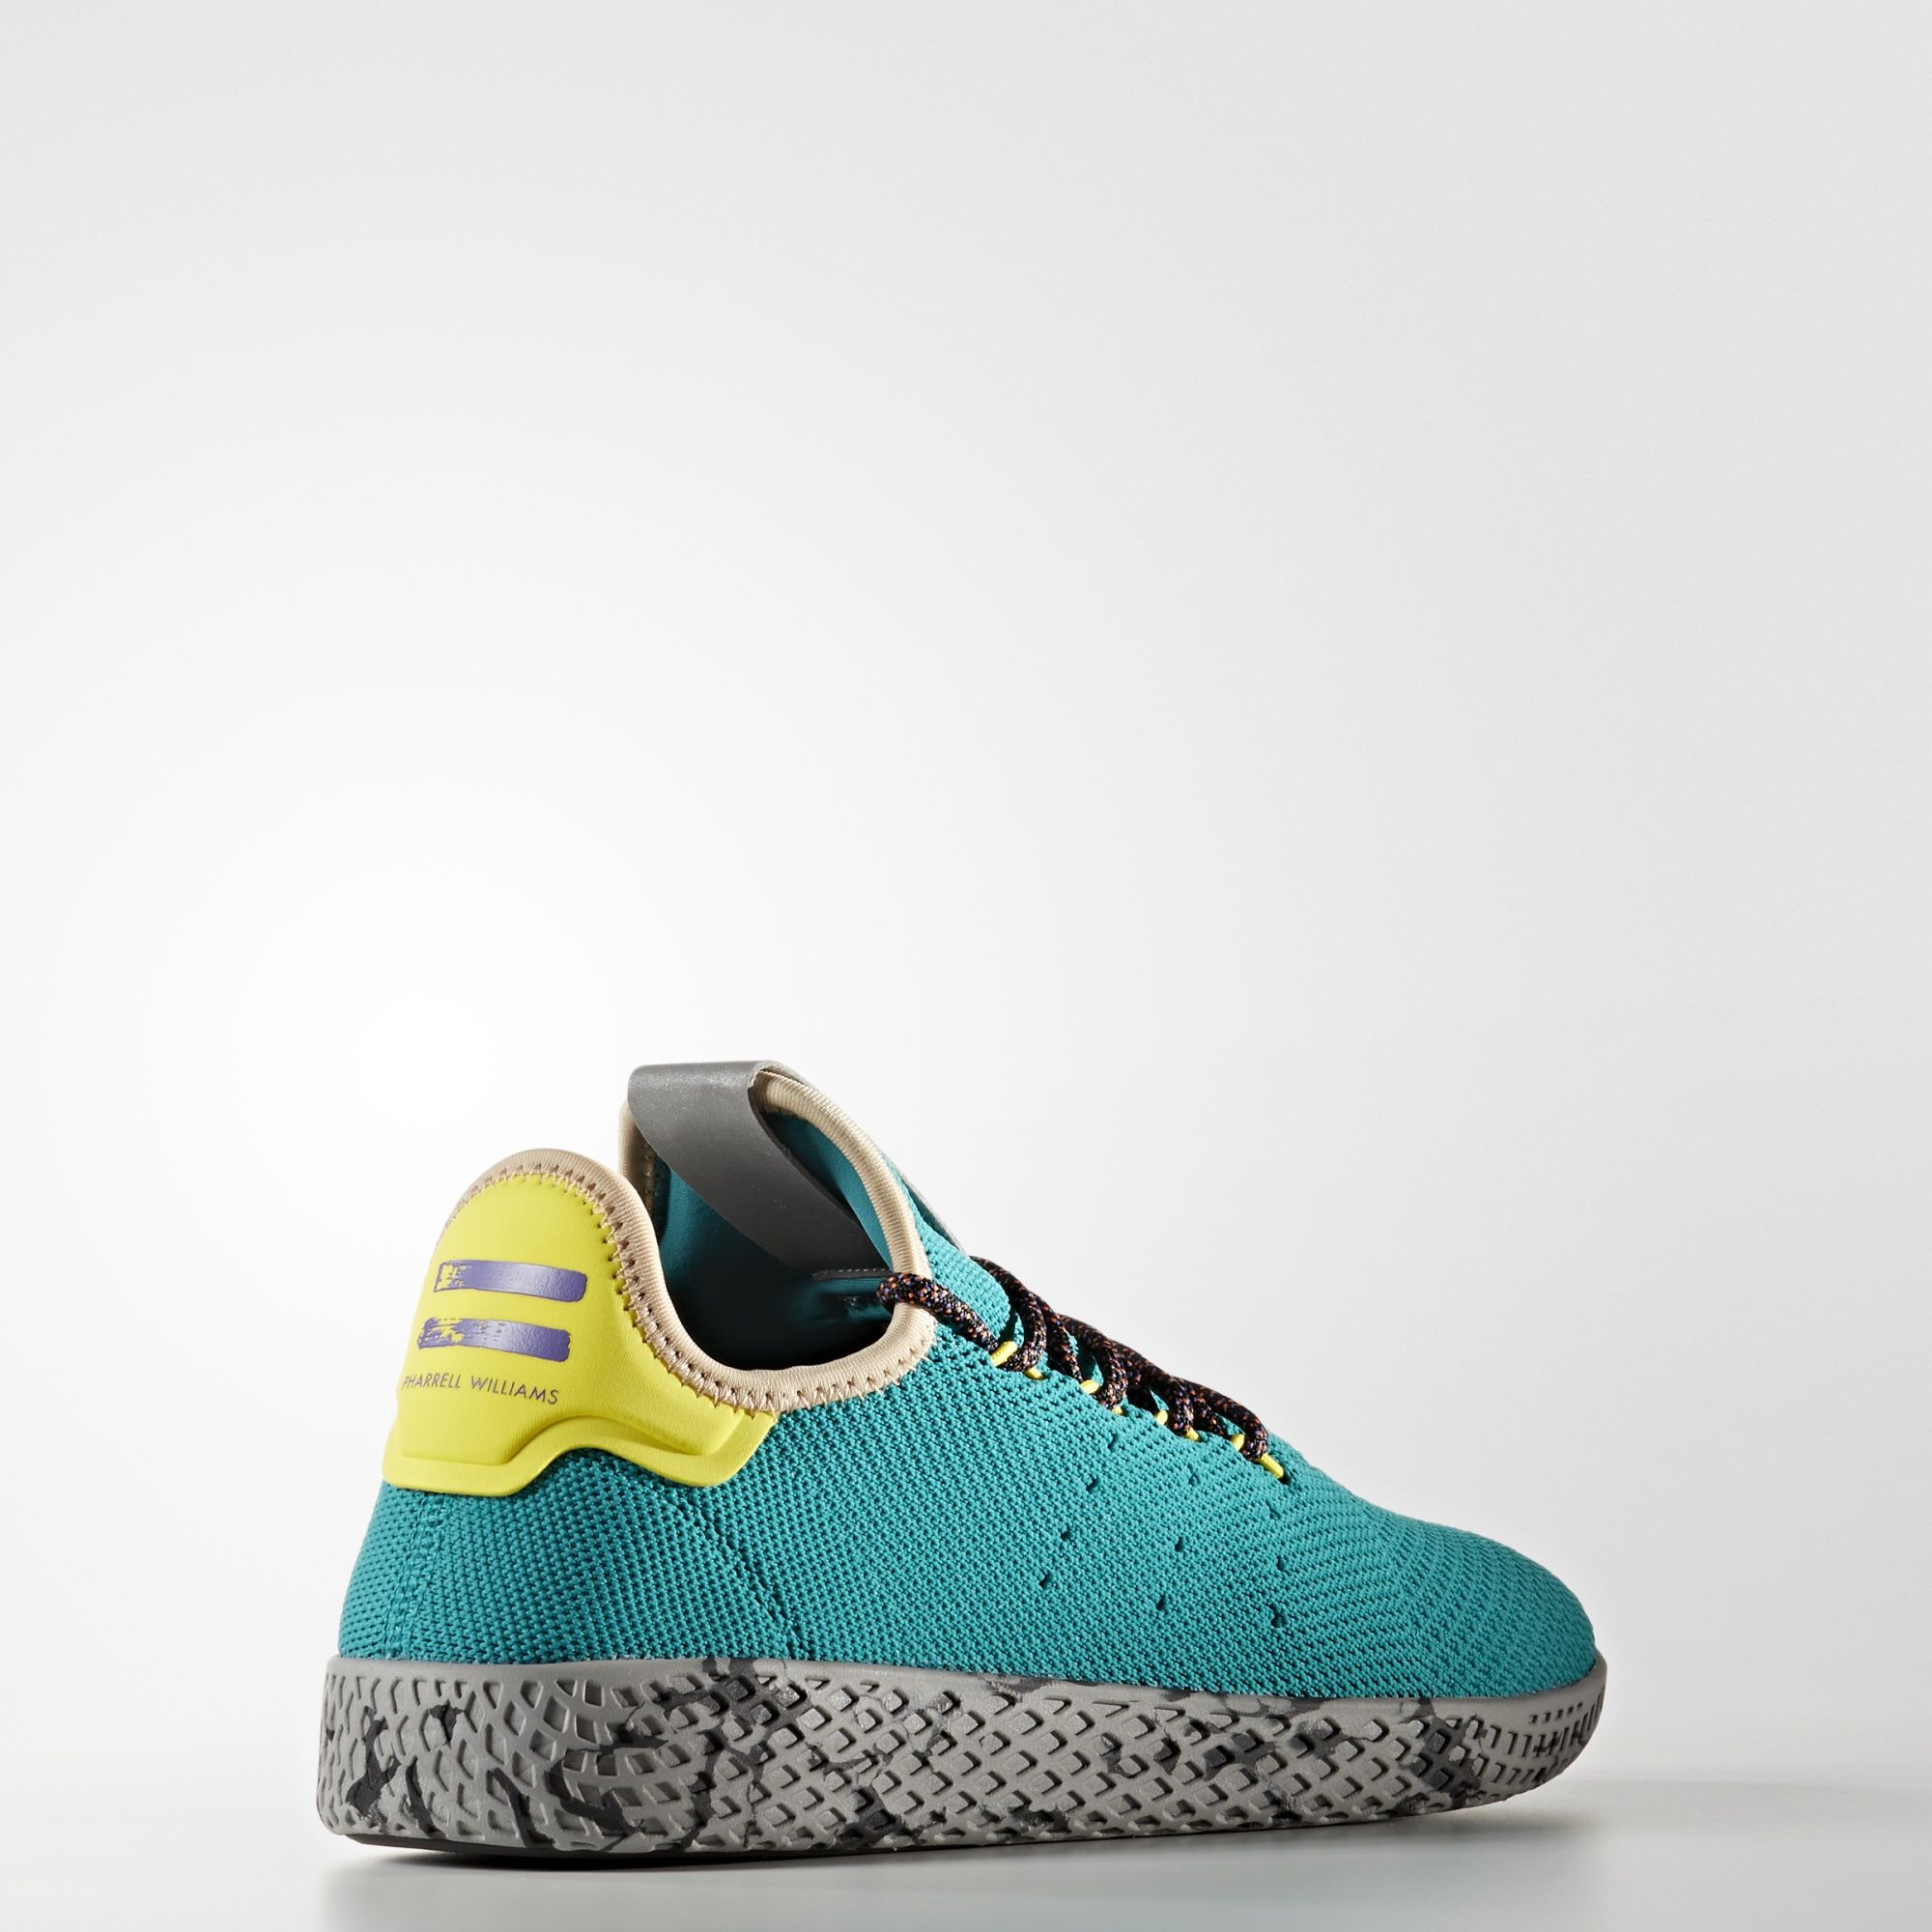 CQ1872 Pharrell Williams x adidas Tennis HU Night Marine 3